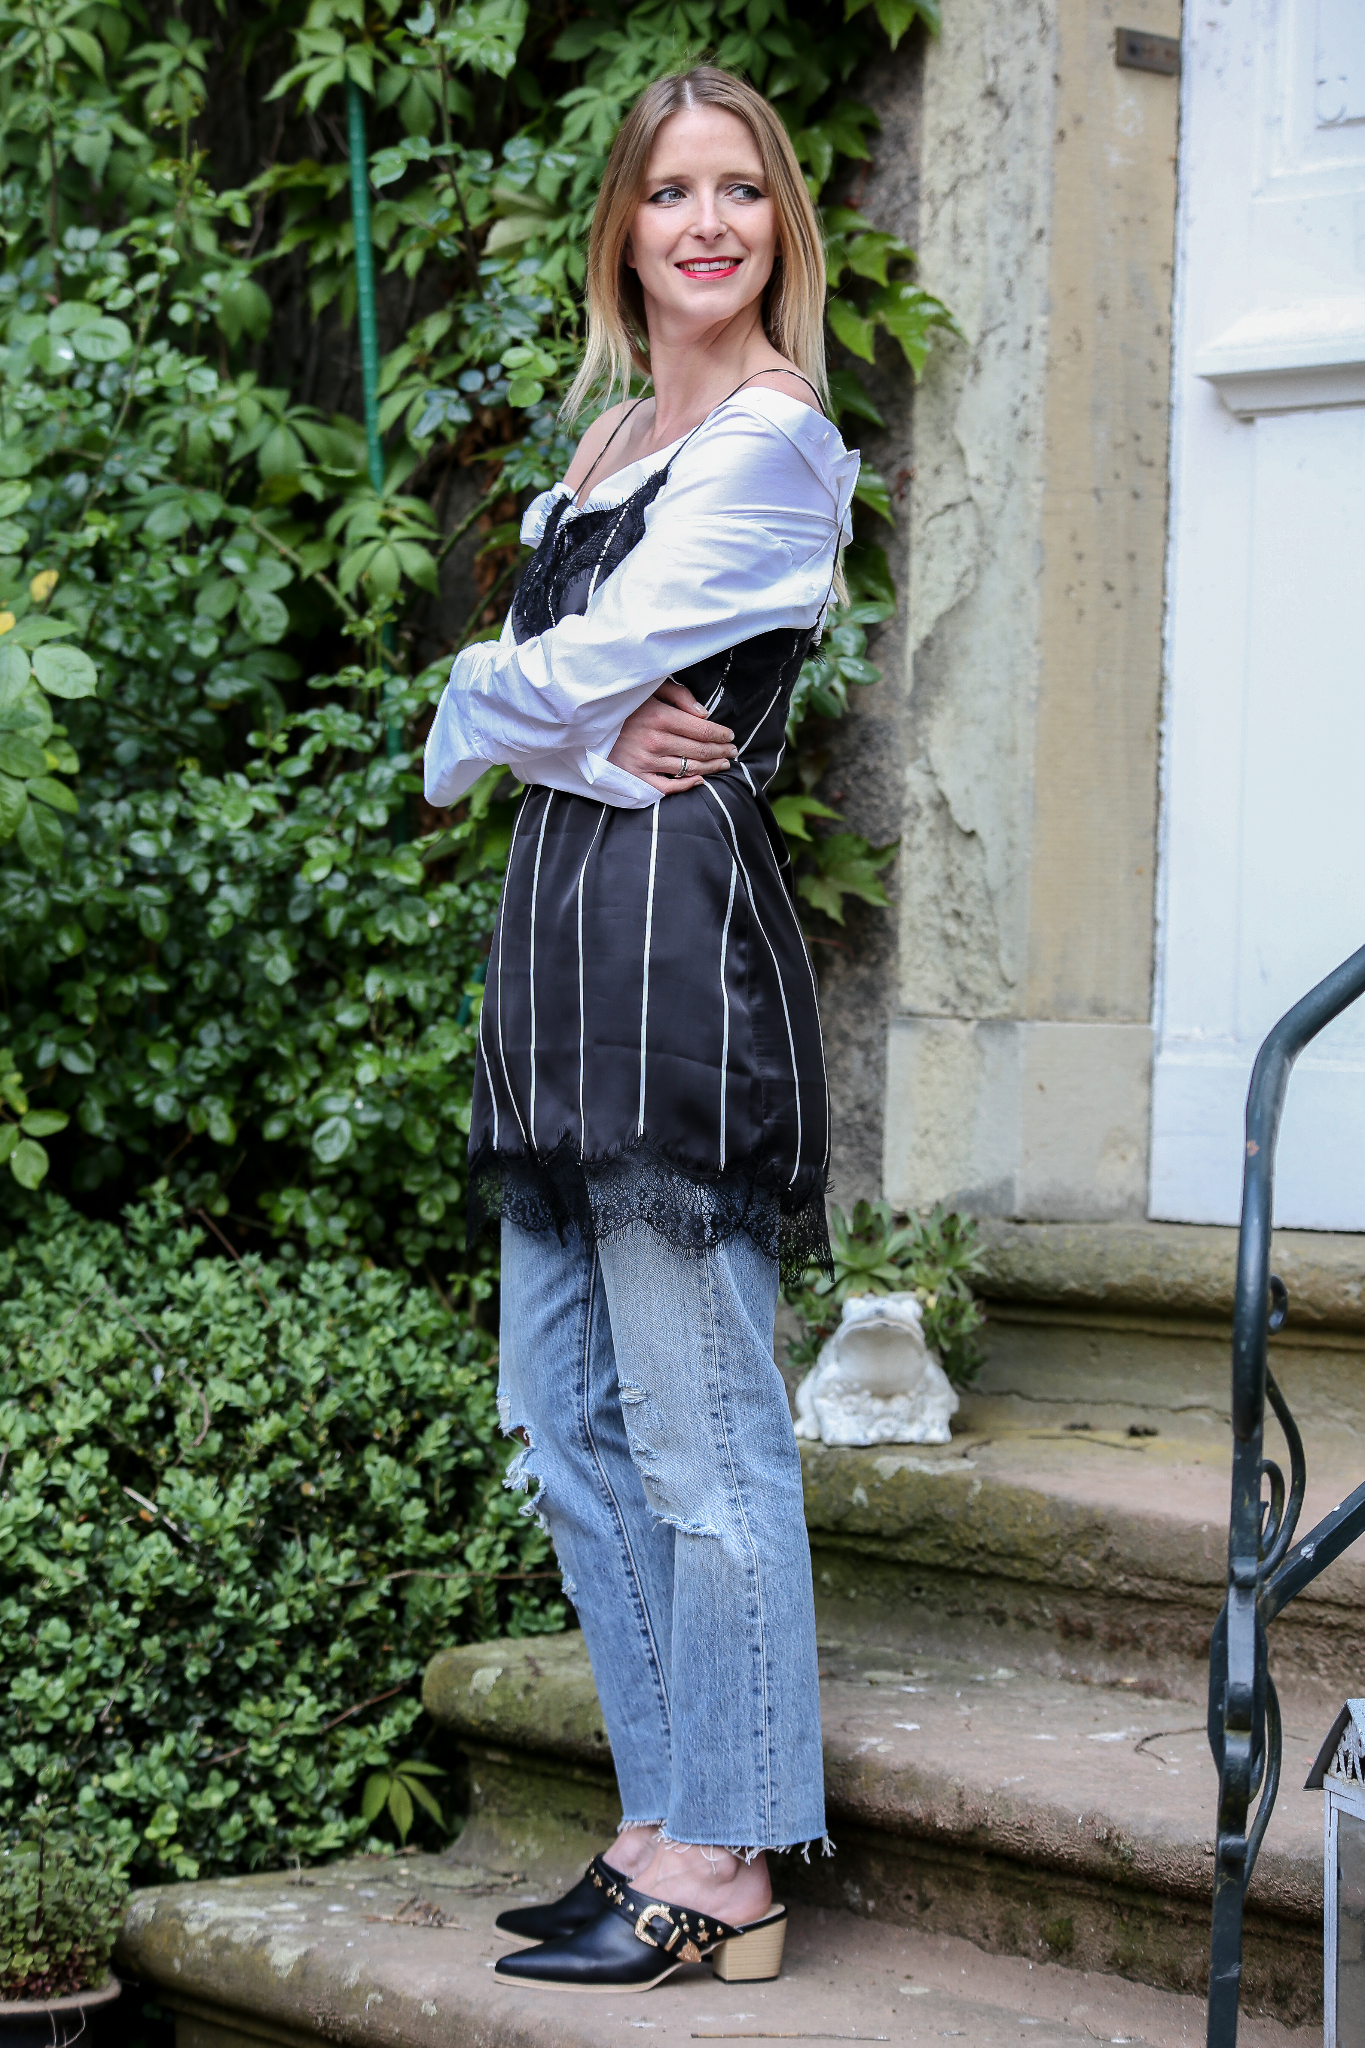 Fashion_Outfit_Off_Shoulder_Striped_Slipdress_MOD - by Monique-32